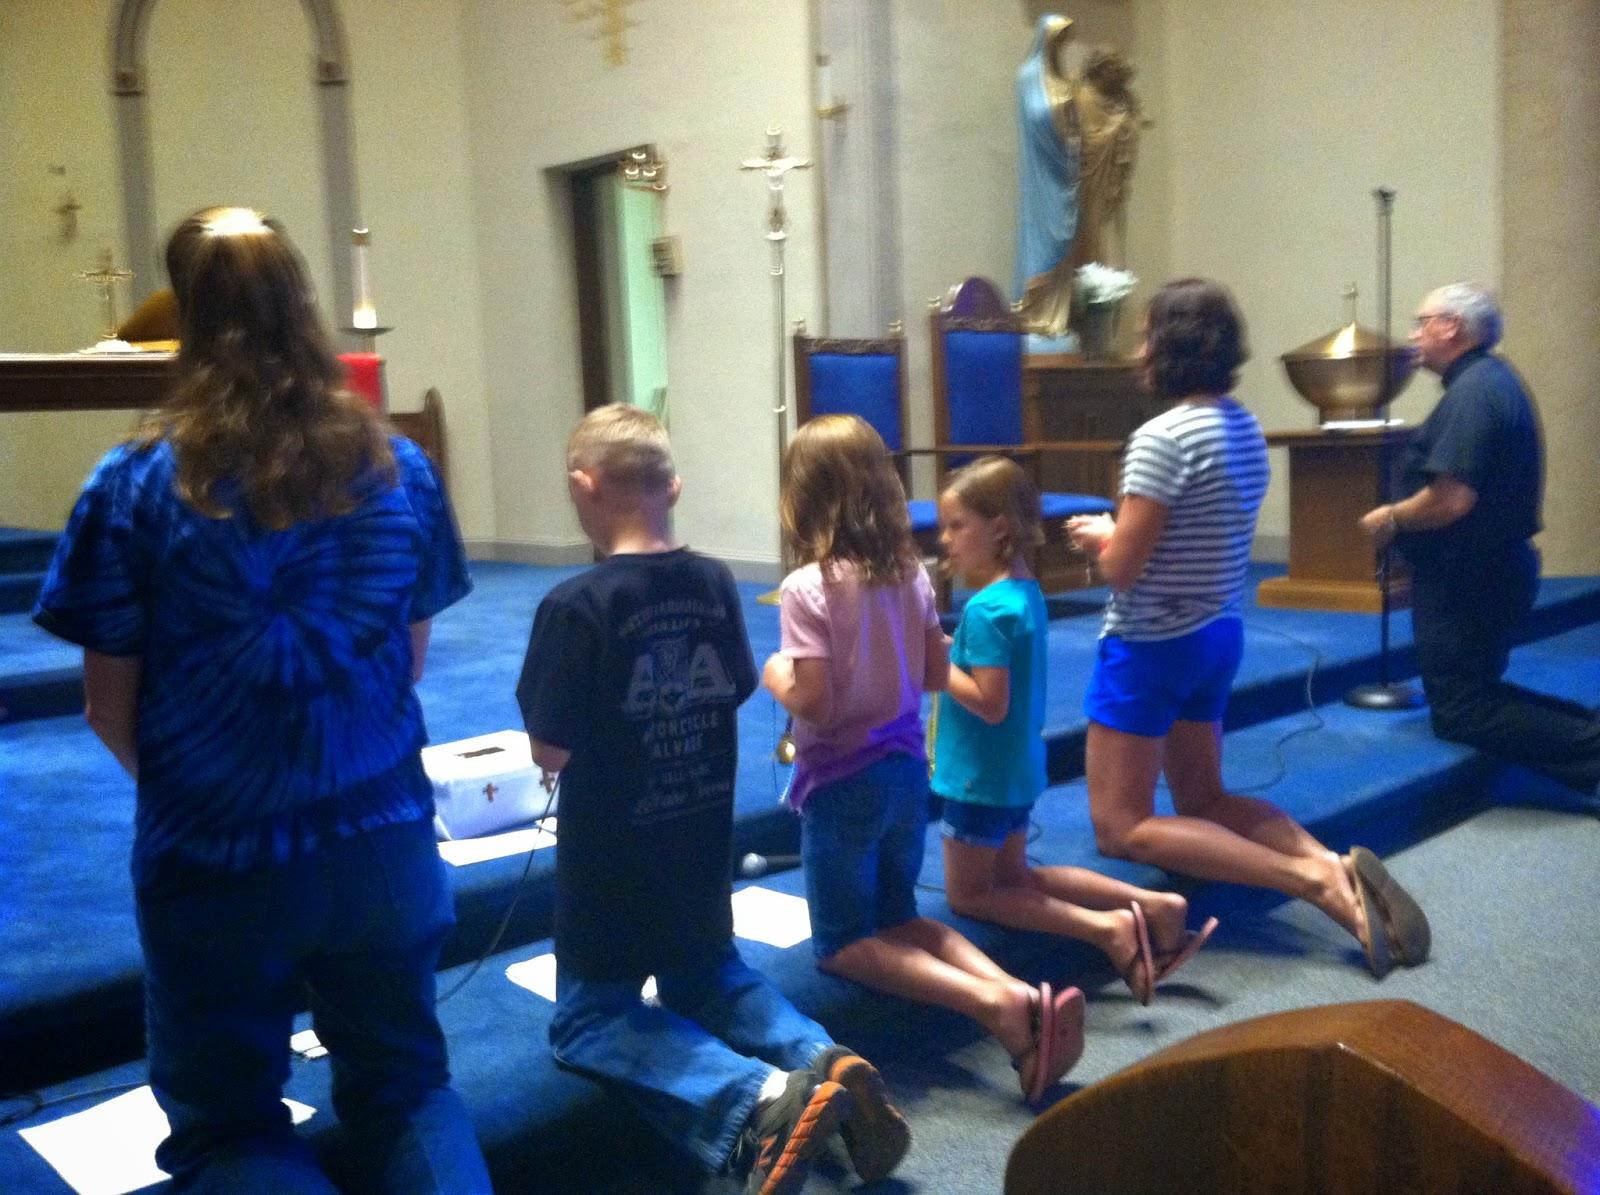 Children S Rosary Starting The School Year In Prayer